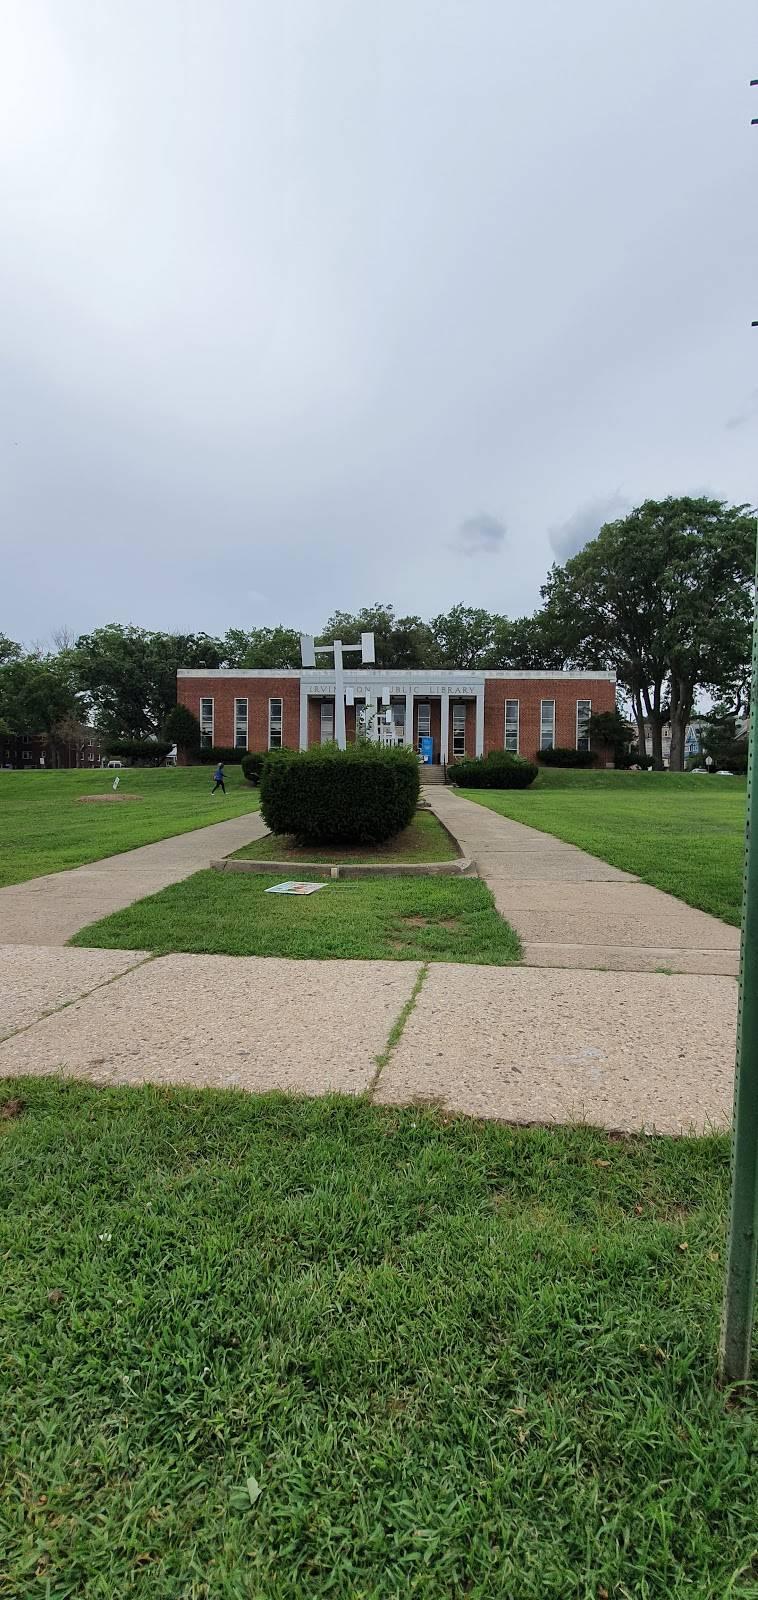 Irvington Public Library - library  | Photo 4 of 6 | Address: 5 Civic Square, Irvington, NJ 07111, USA | Phone: (973) 372-6400